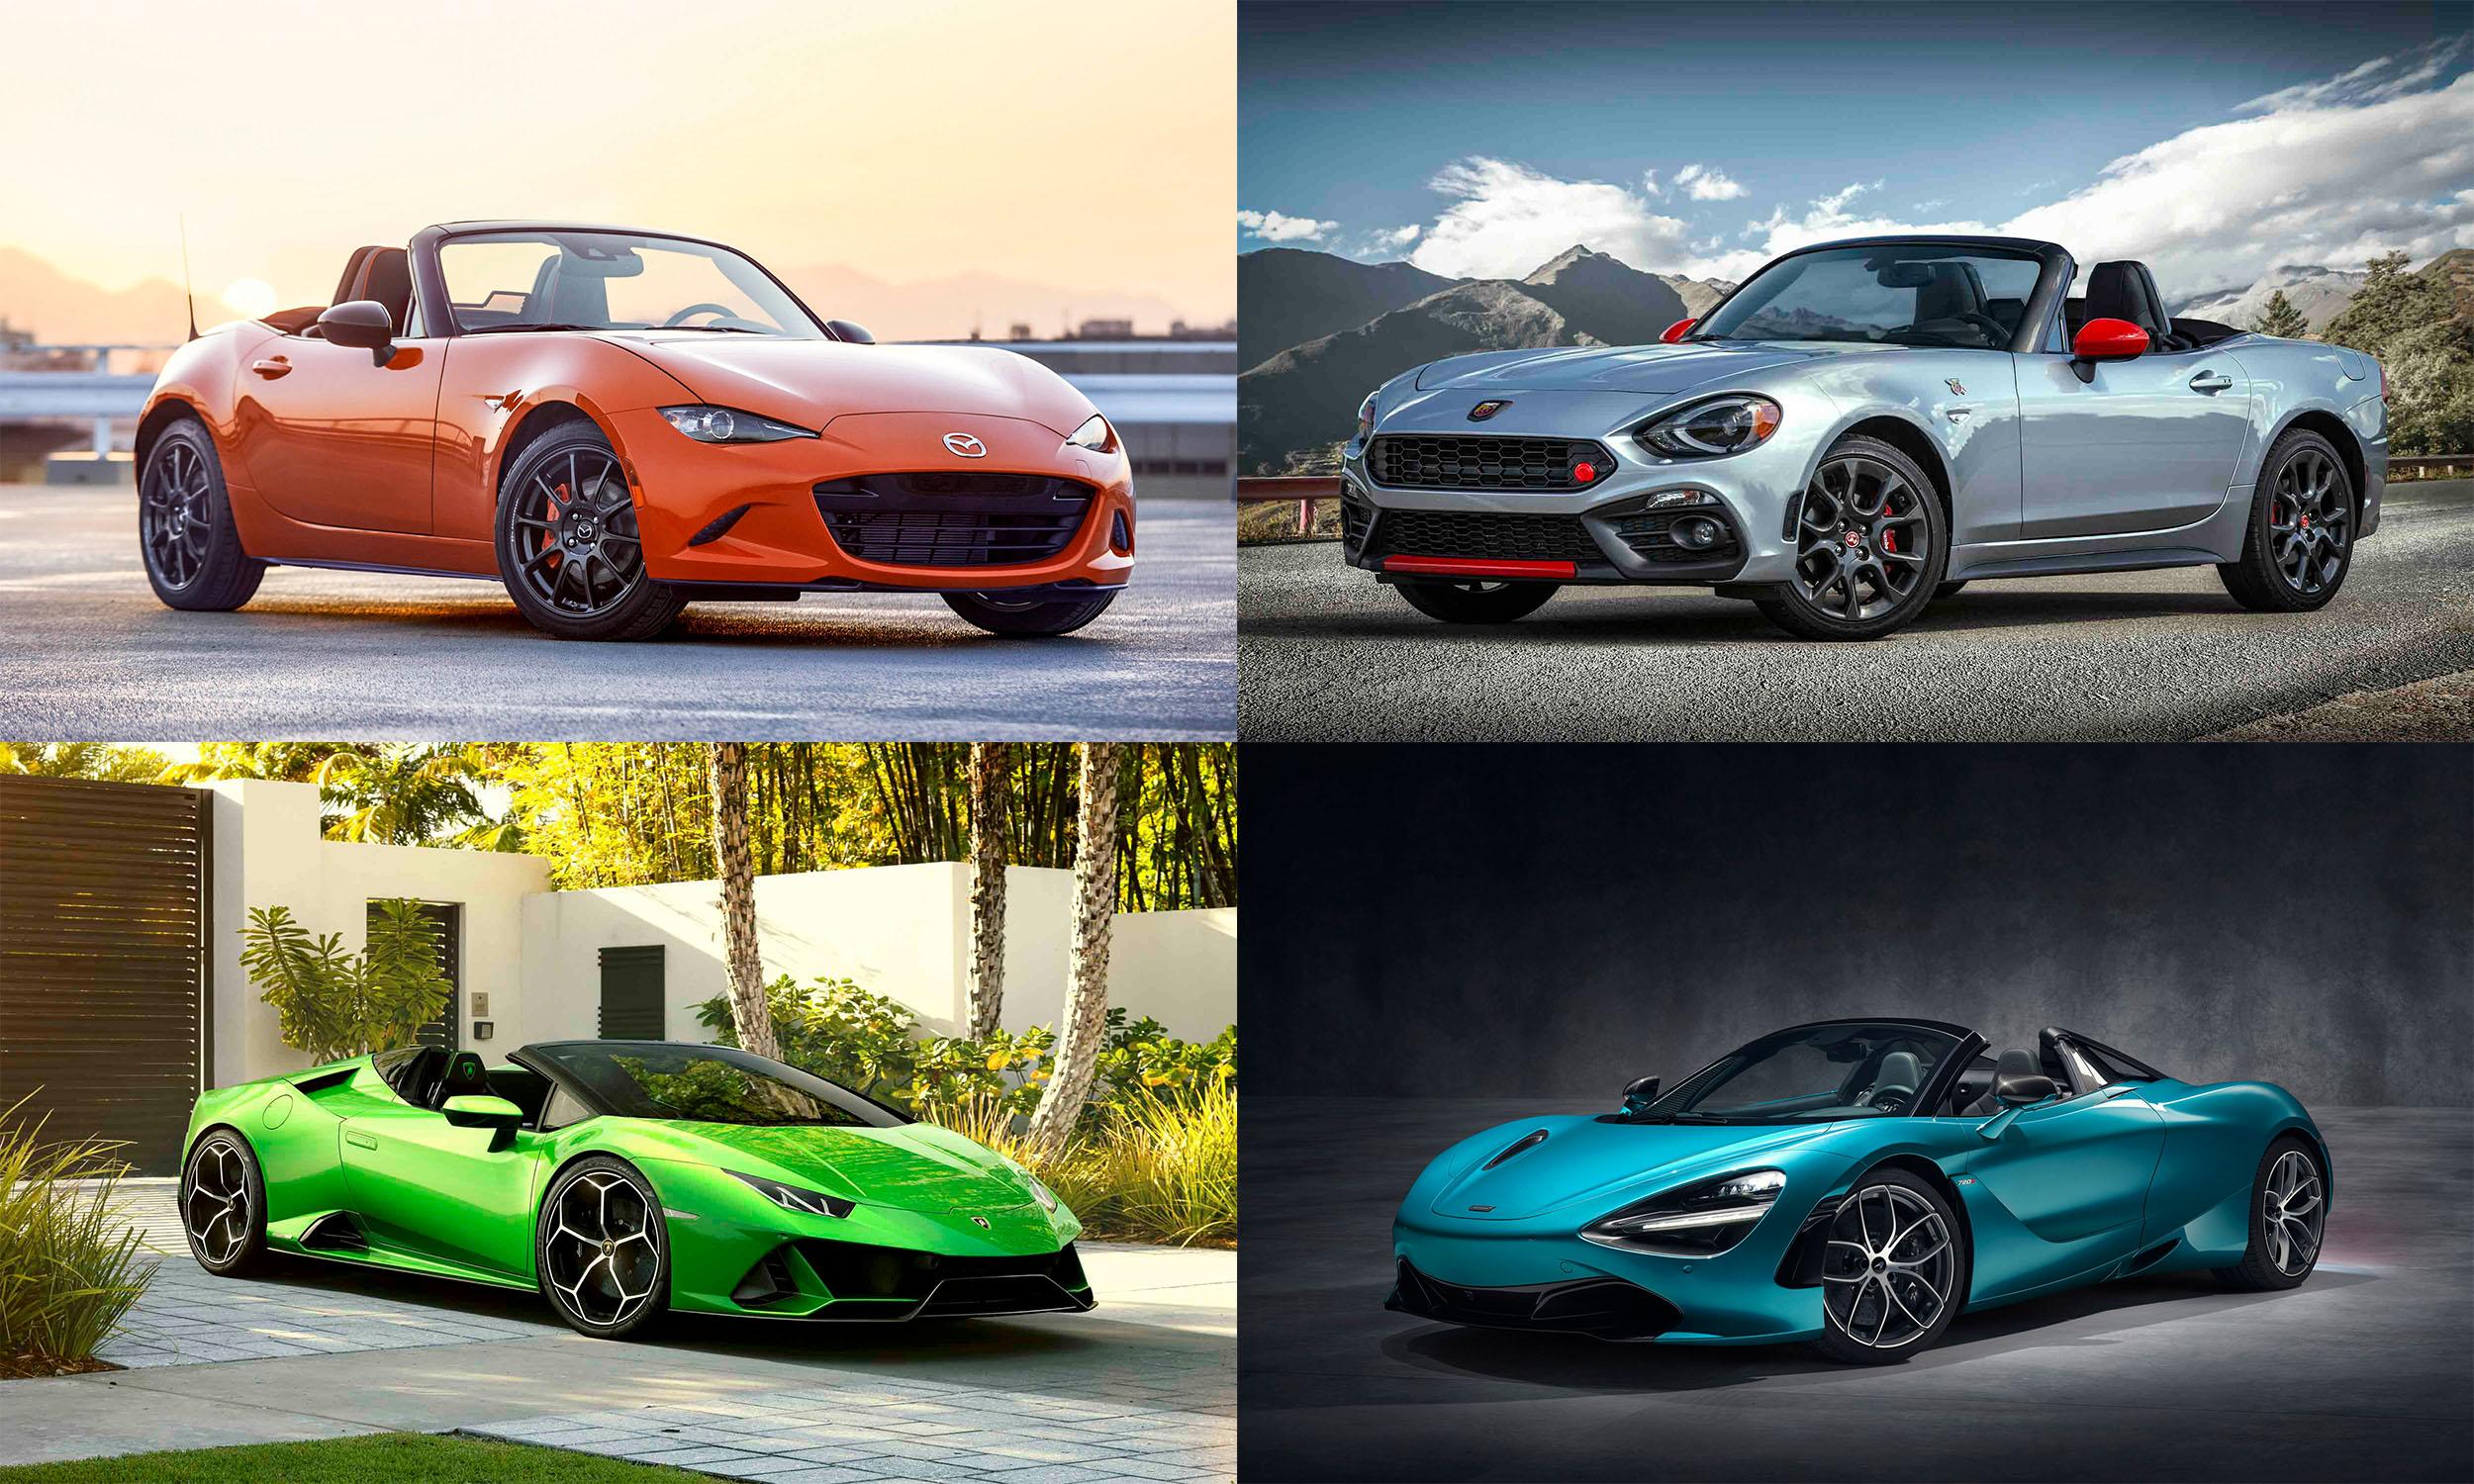 © Mazda North American Operations; FCA US LLC; © McLaren Automotive Limited; Automobili Lamborghini S.p.A.